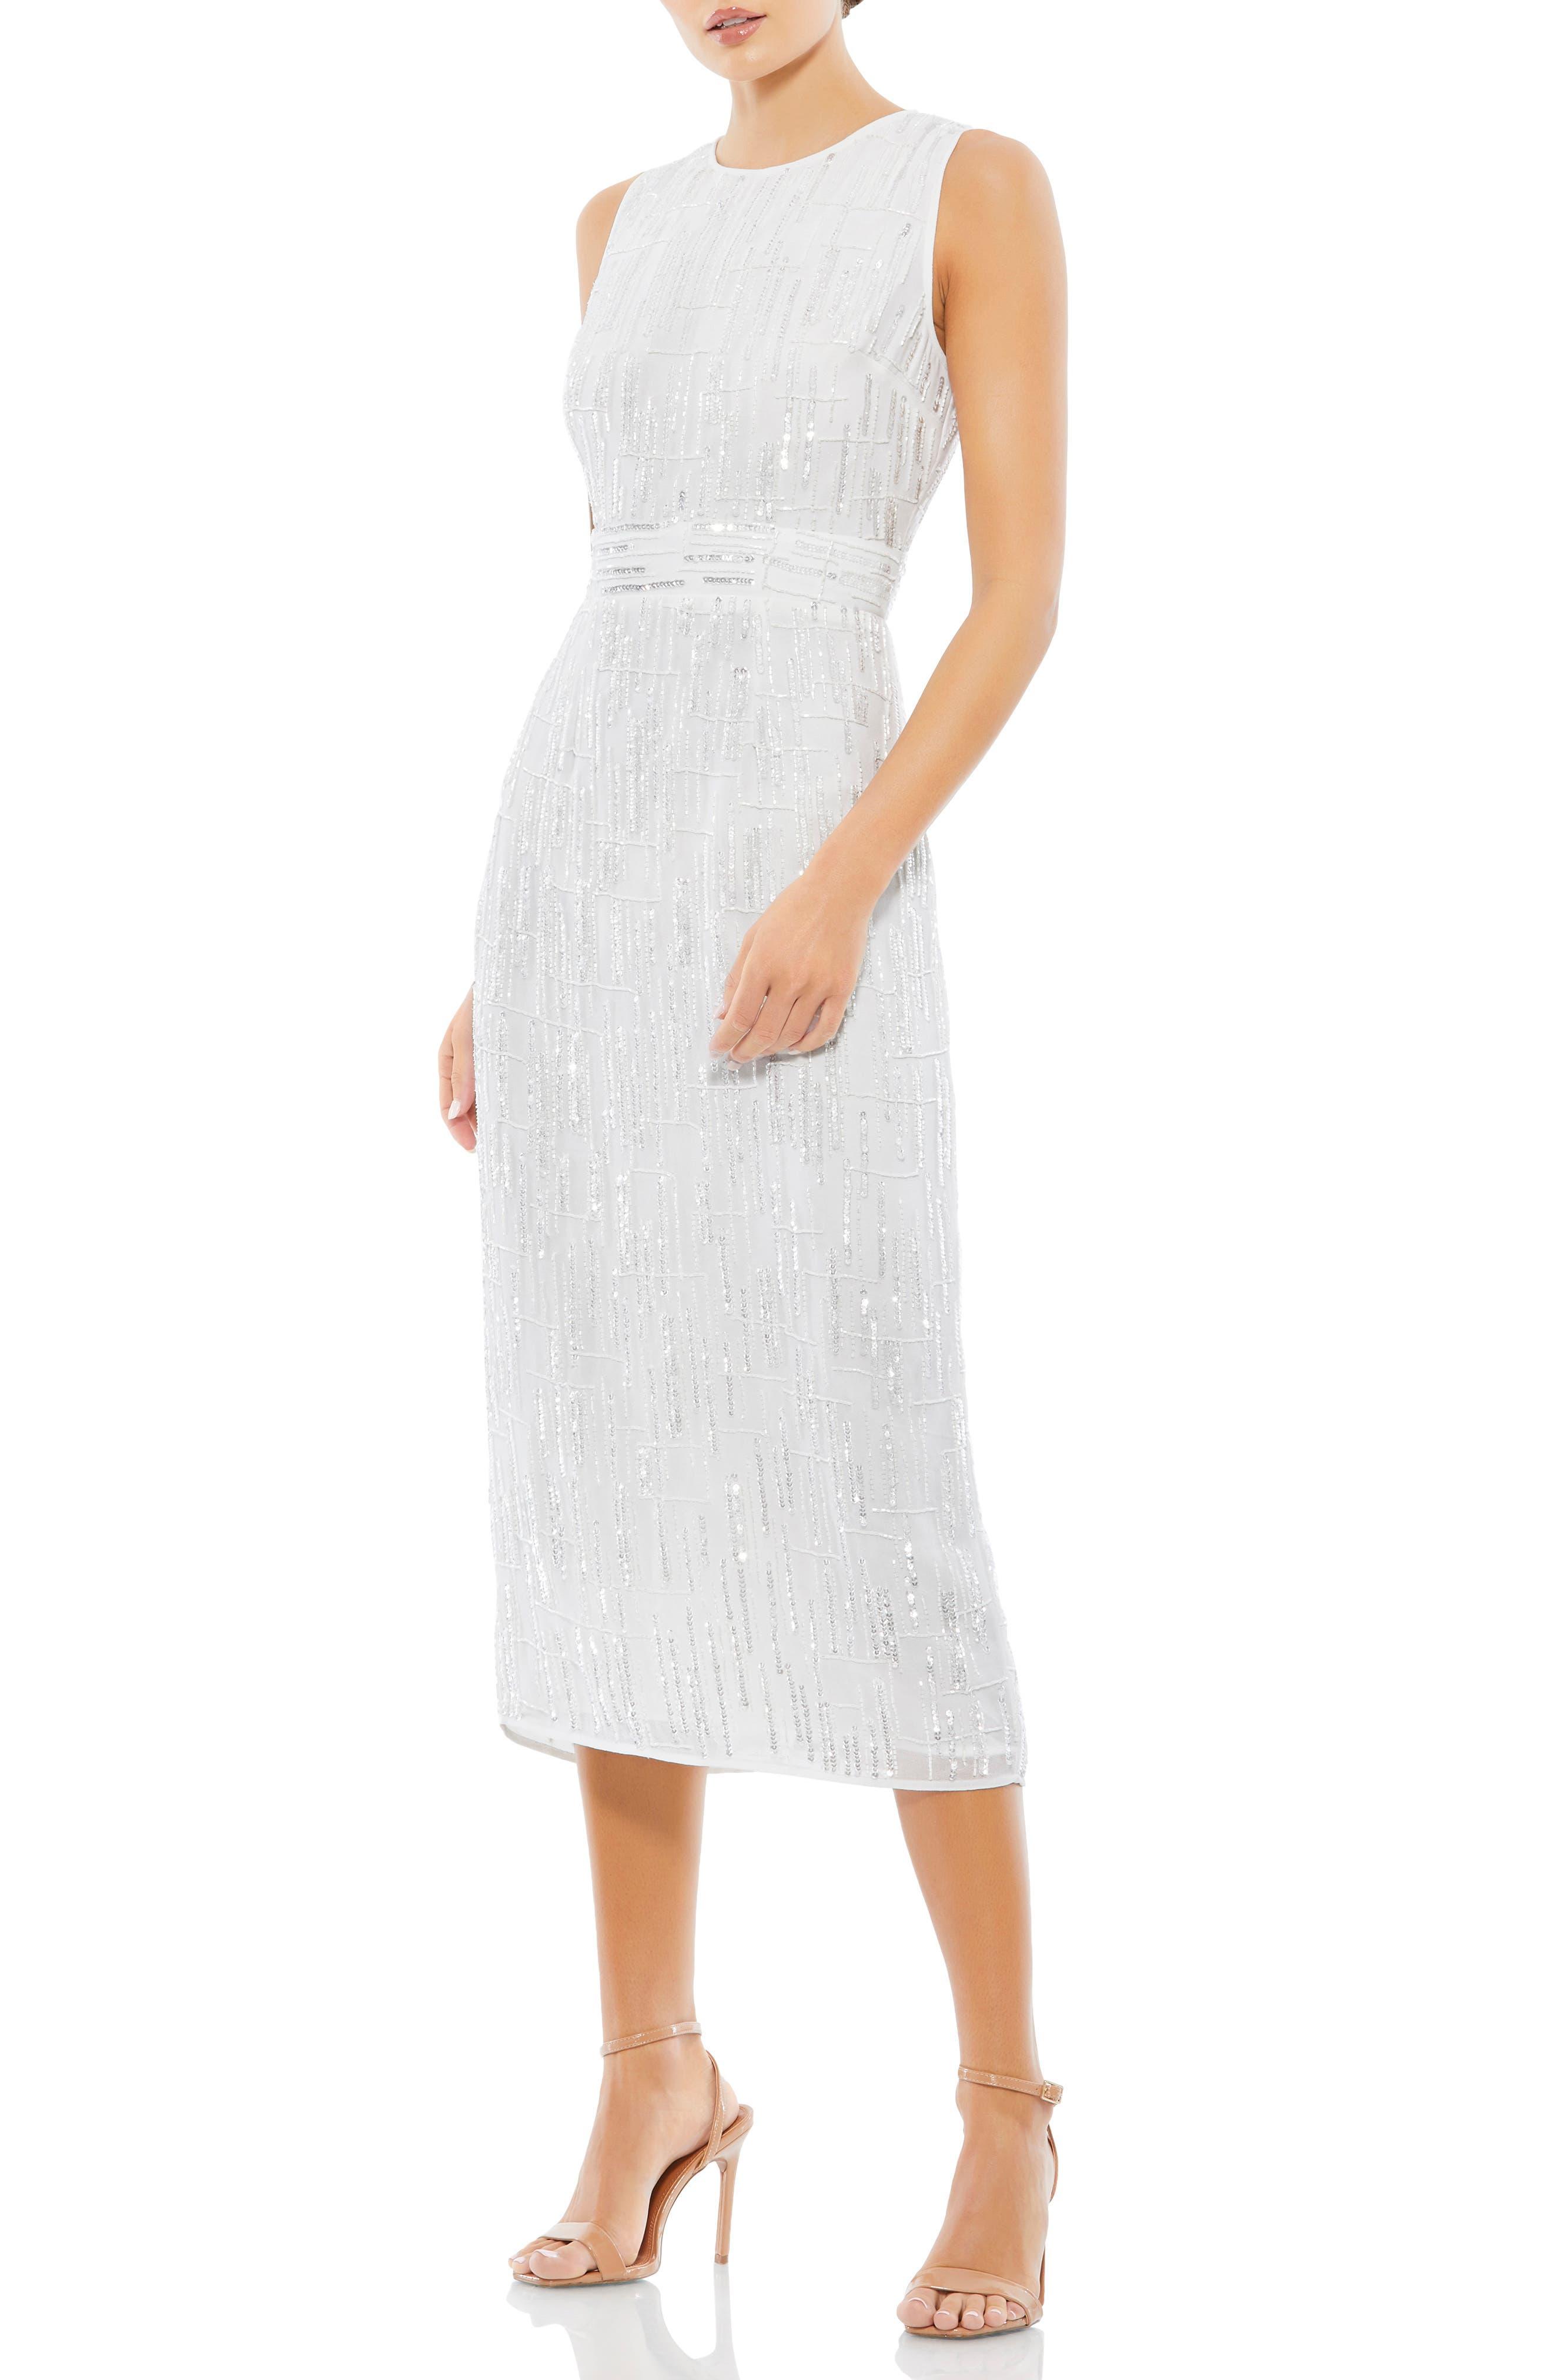 60s Wedding Dresses   70s Wedding Dresses Mac Duggal Sequin Mesh Sheath Dress Size 12 in White at Nordstrom $398.00 AT vintagedancer.com